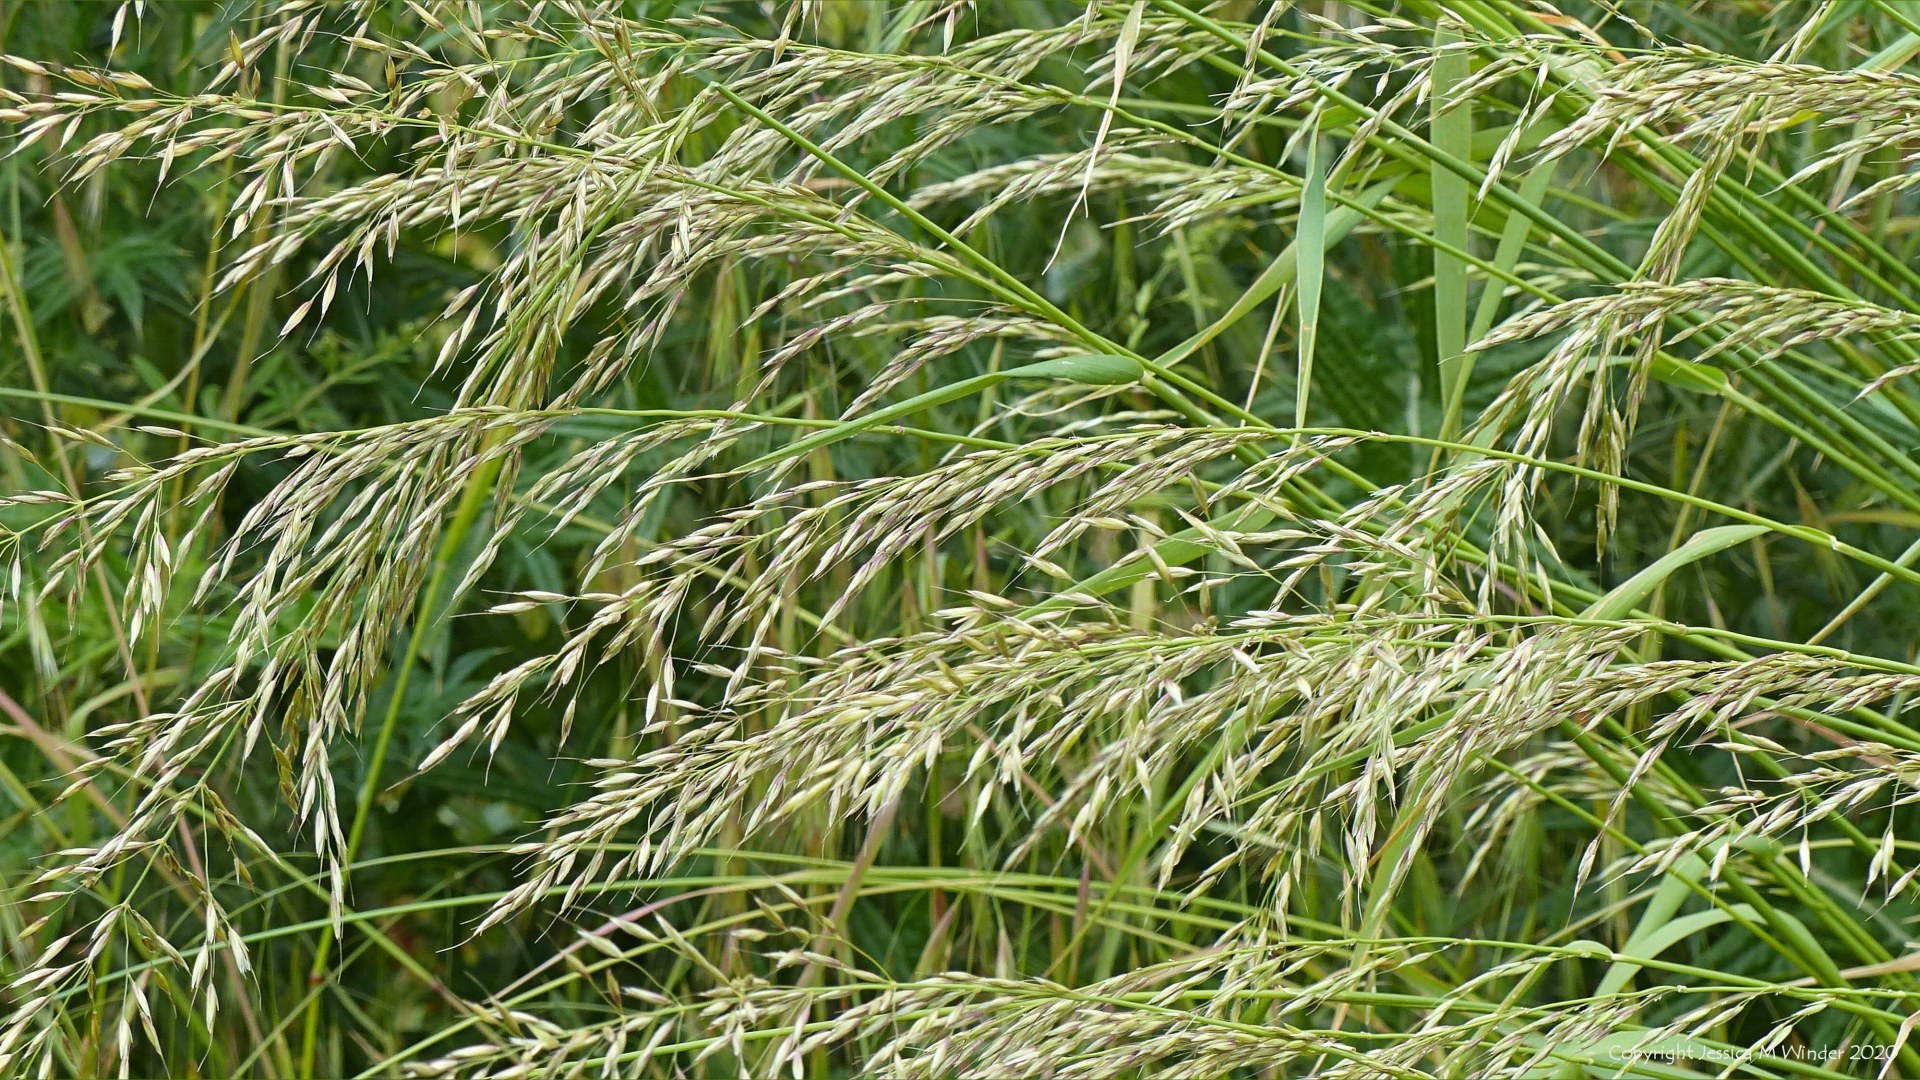 Wild flowering summer grasses in a Dorset field